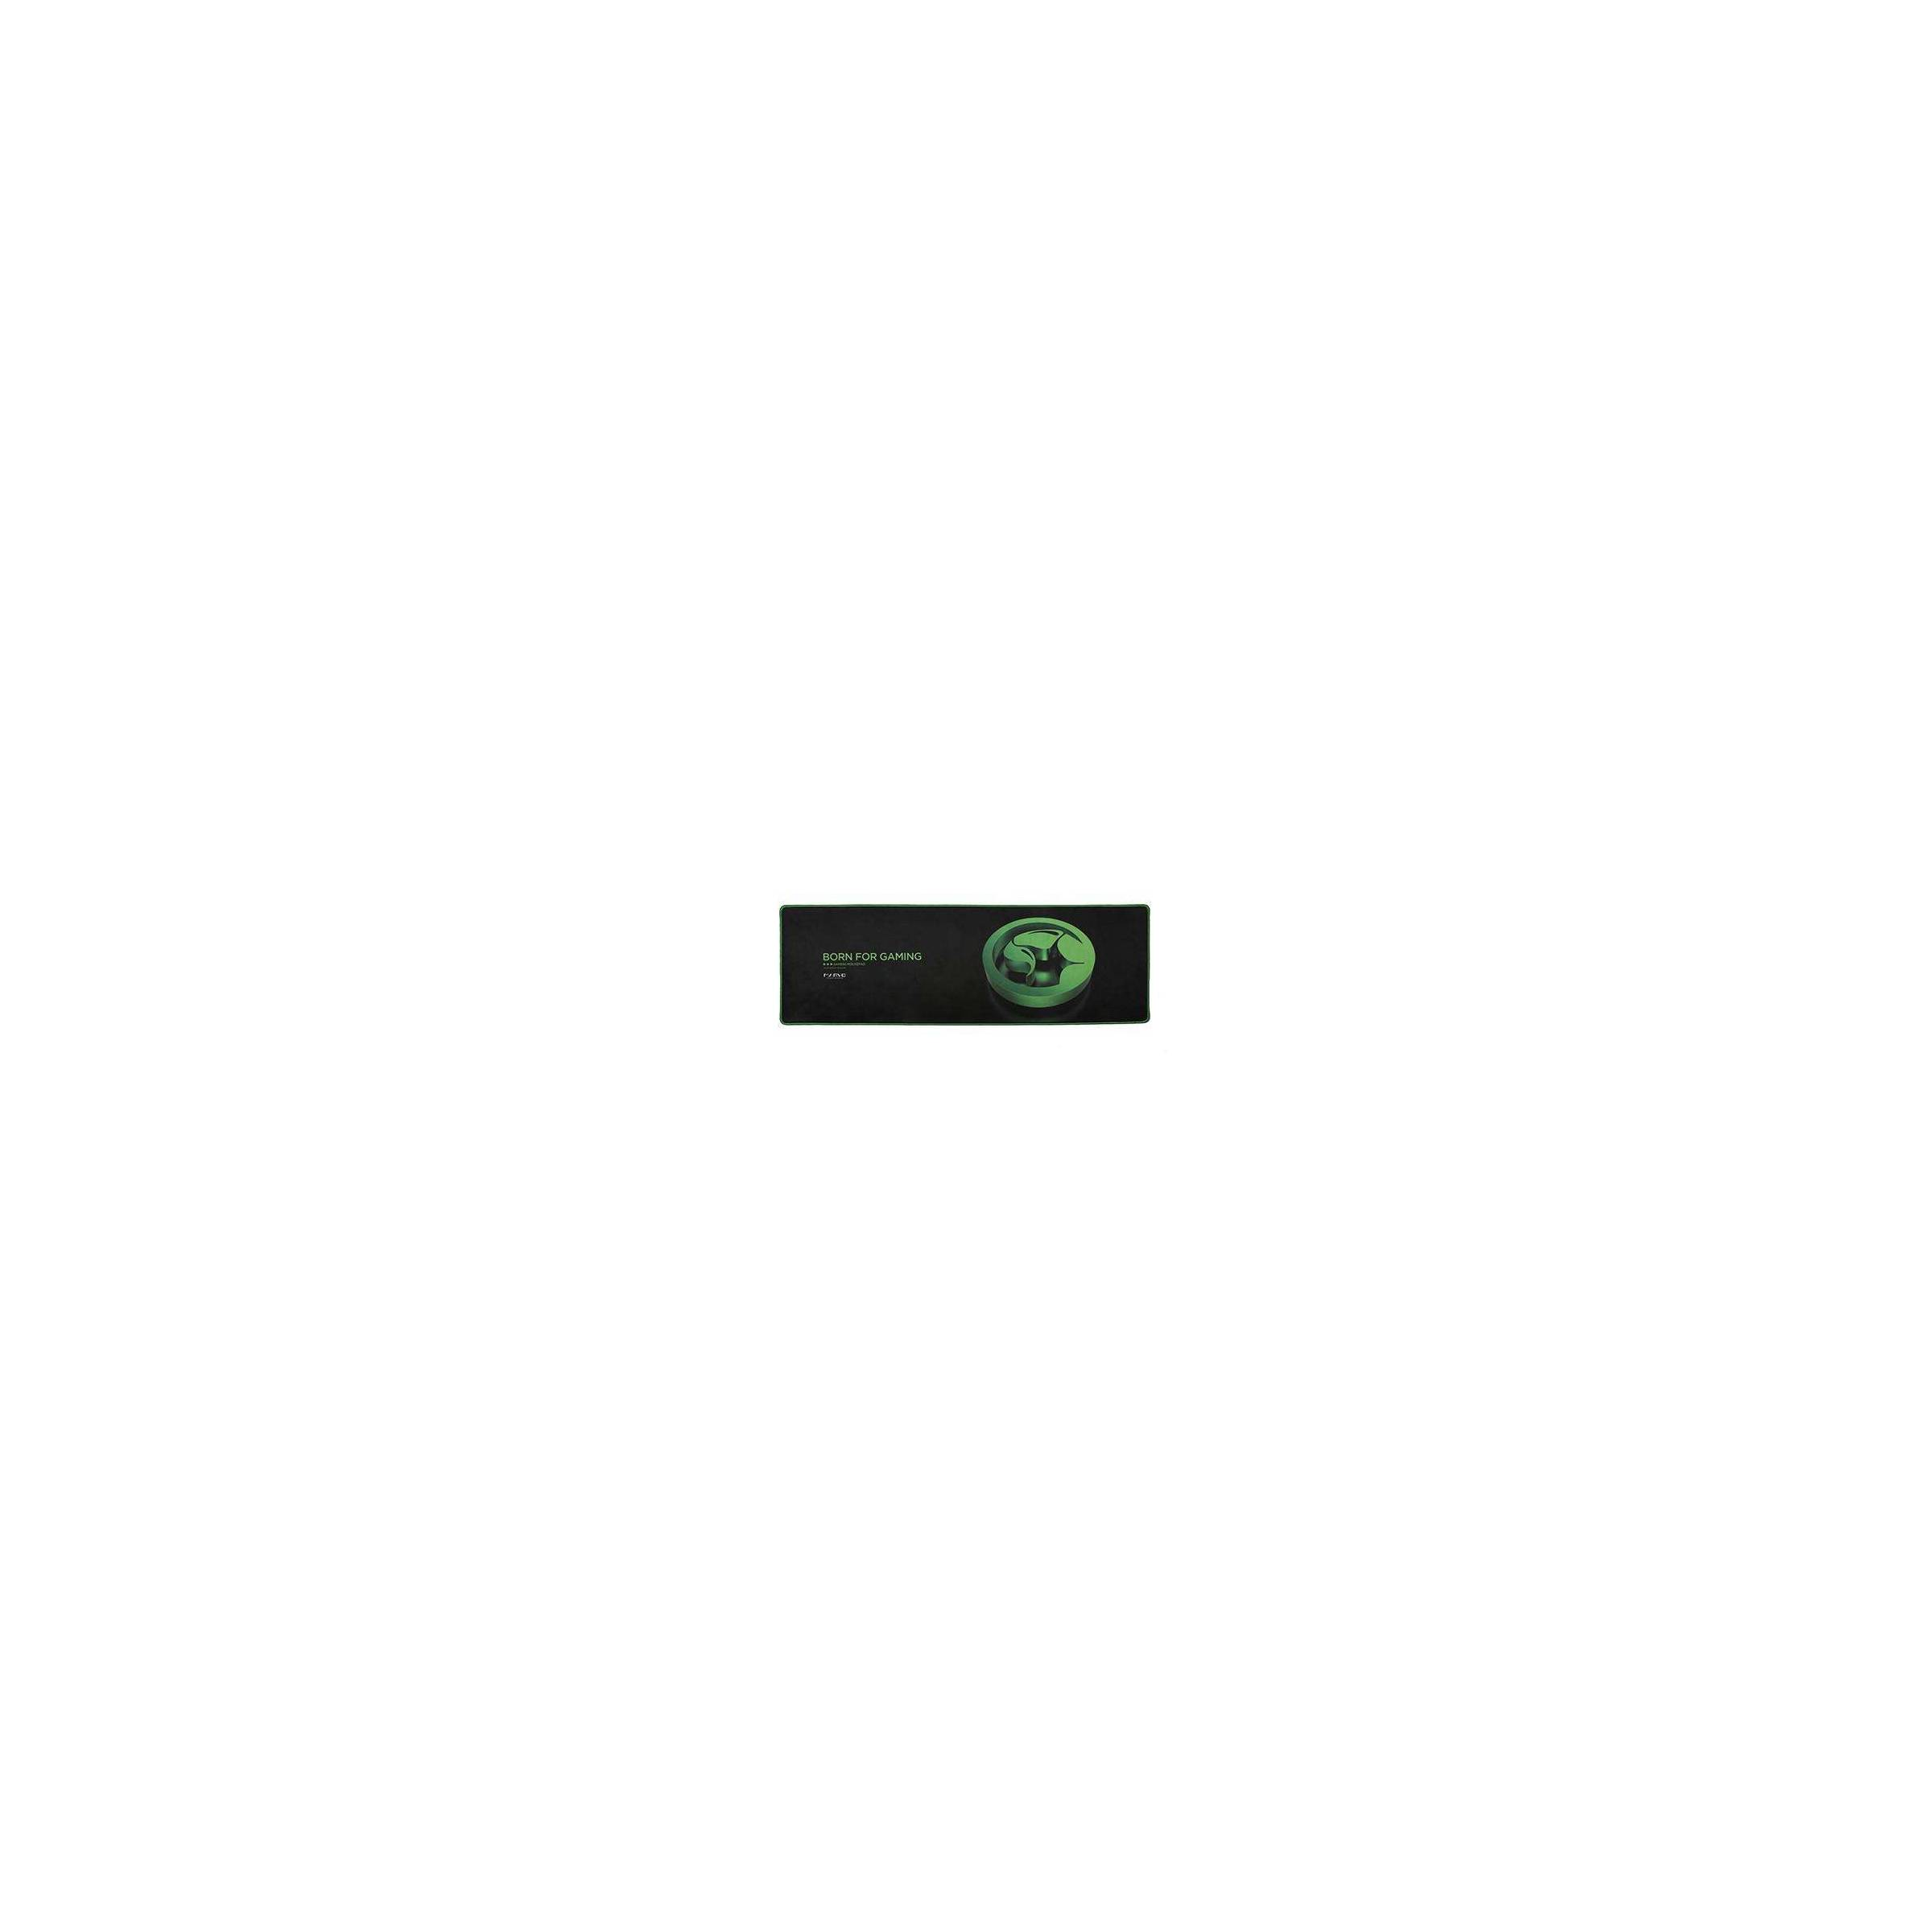 scorpion by marvo – Marvo gaming musemåtte g13 grøn fra mackabler.dk